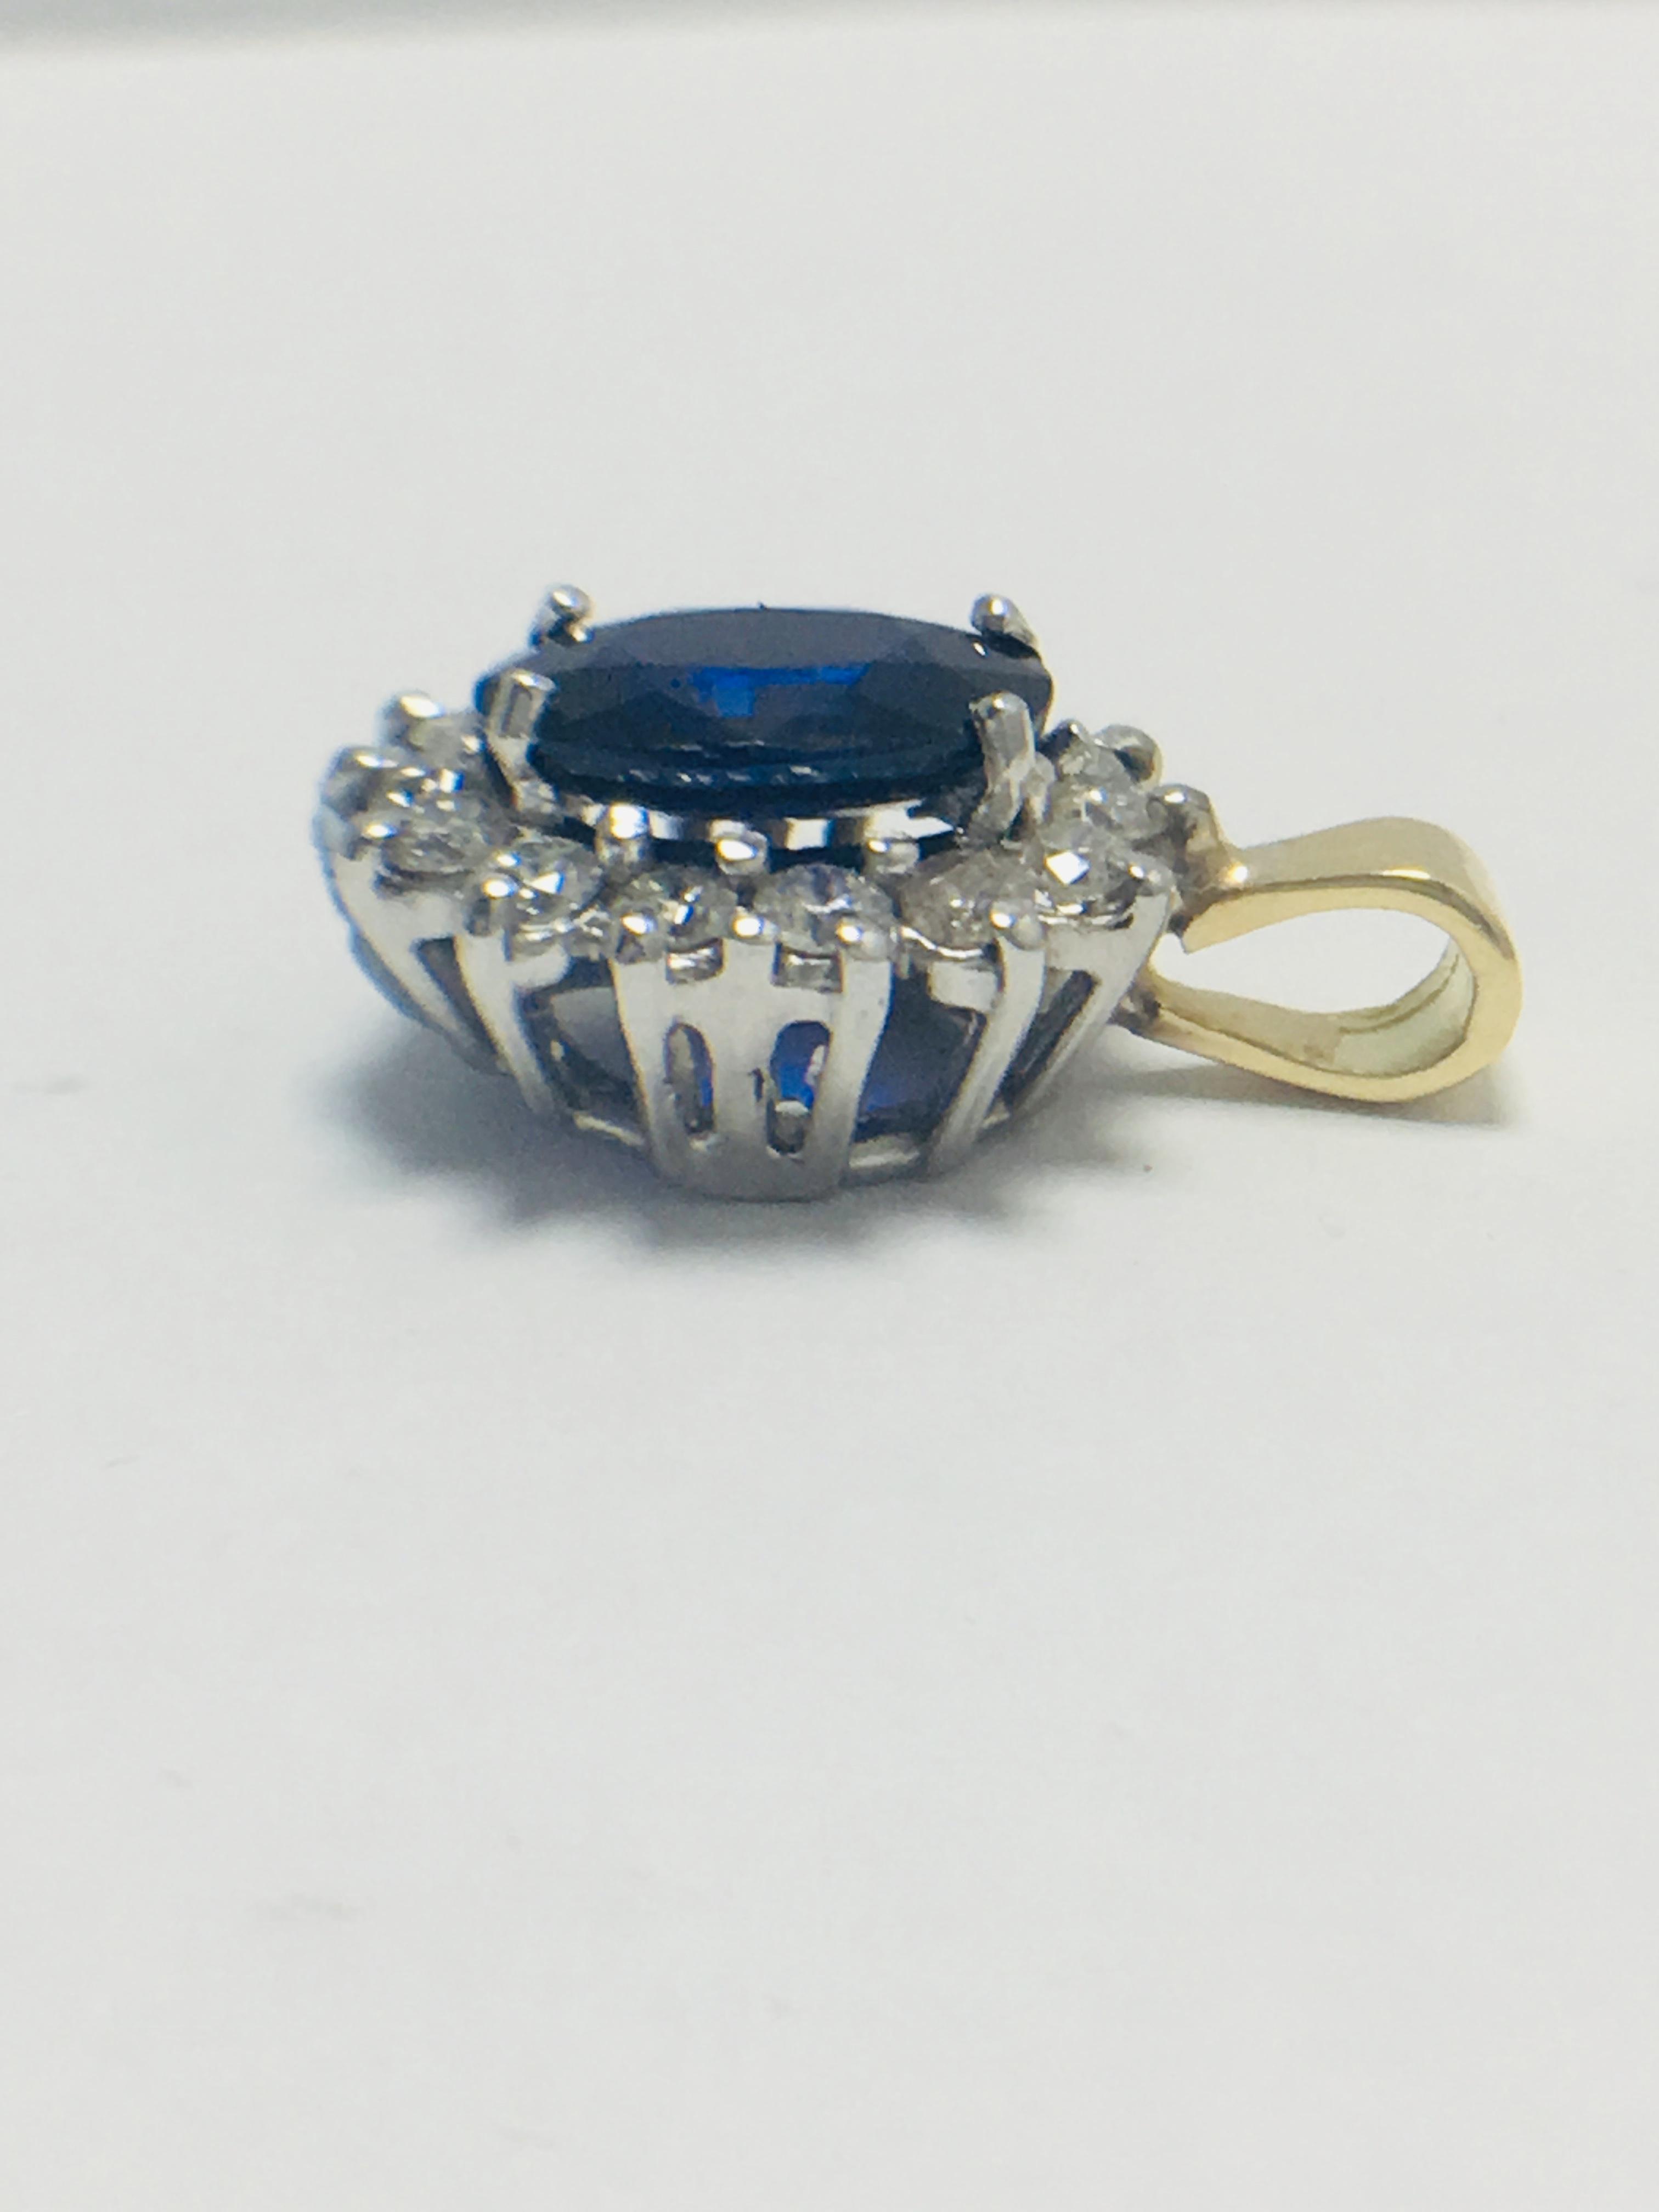 Sapphire and Diamond pendant,18ct gold - Image 3 of 7